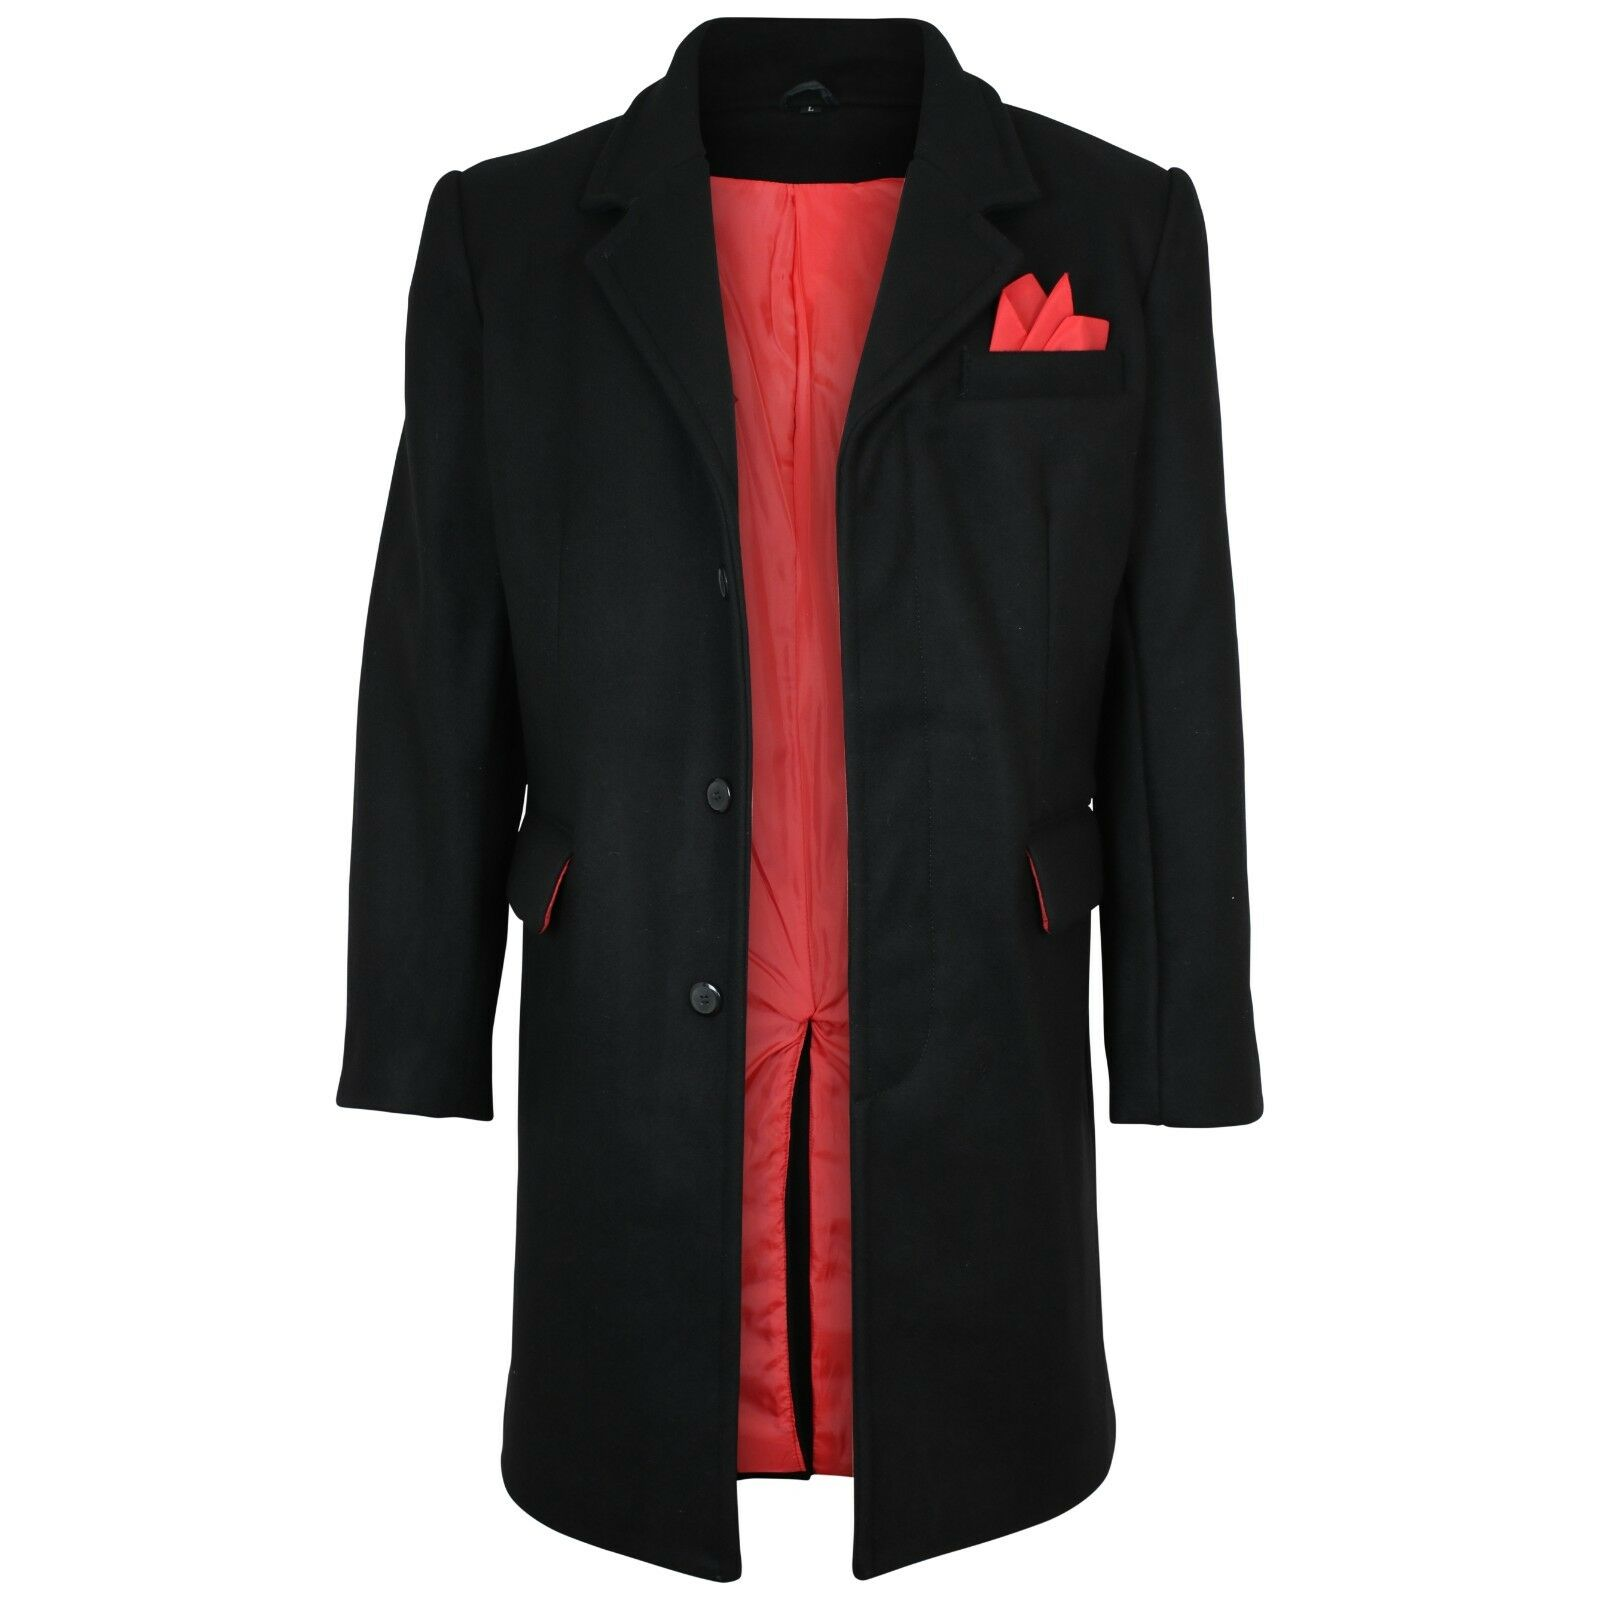 Relco  Herren Mod Coat/Overcoat With ROT Lining 80% Wool Original Timeless Cut